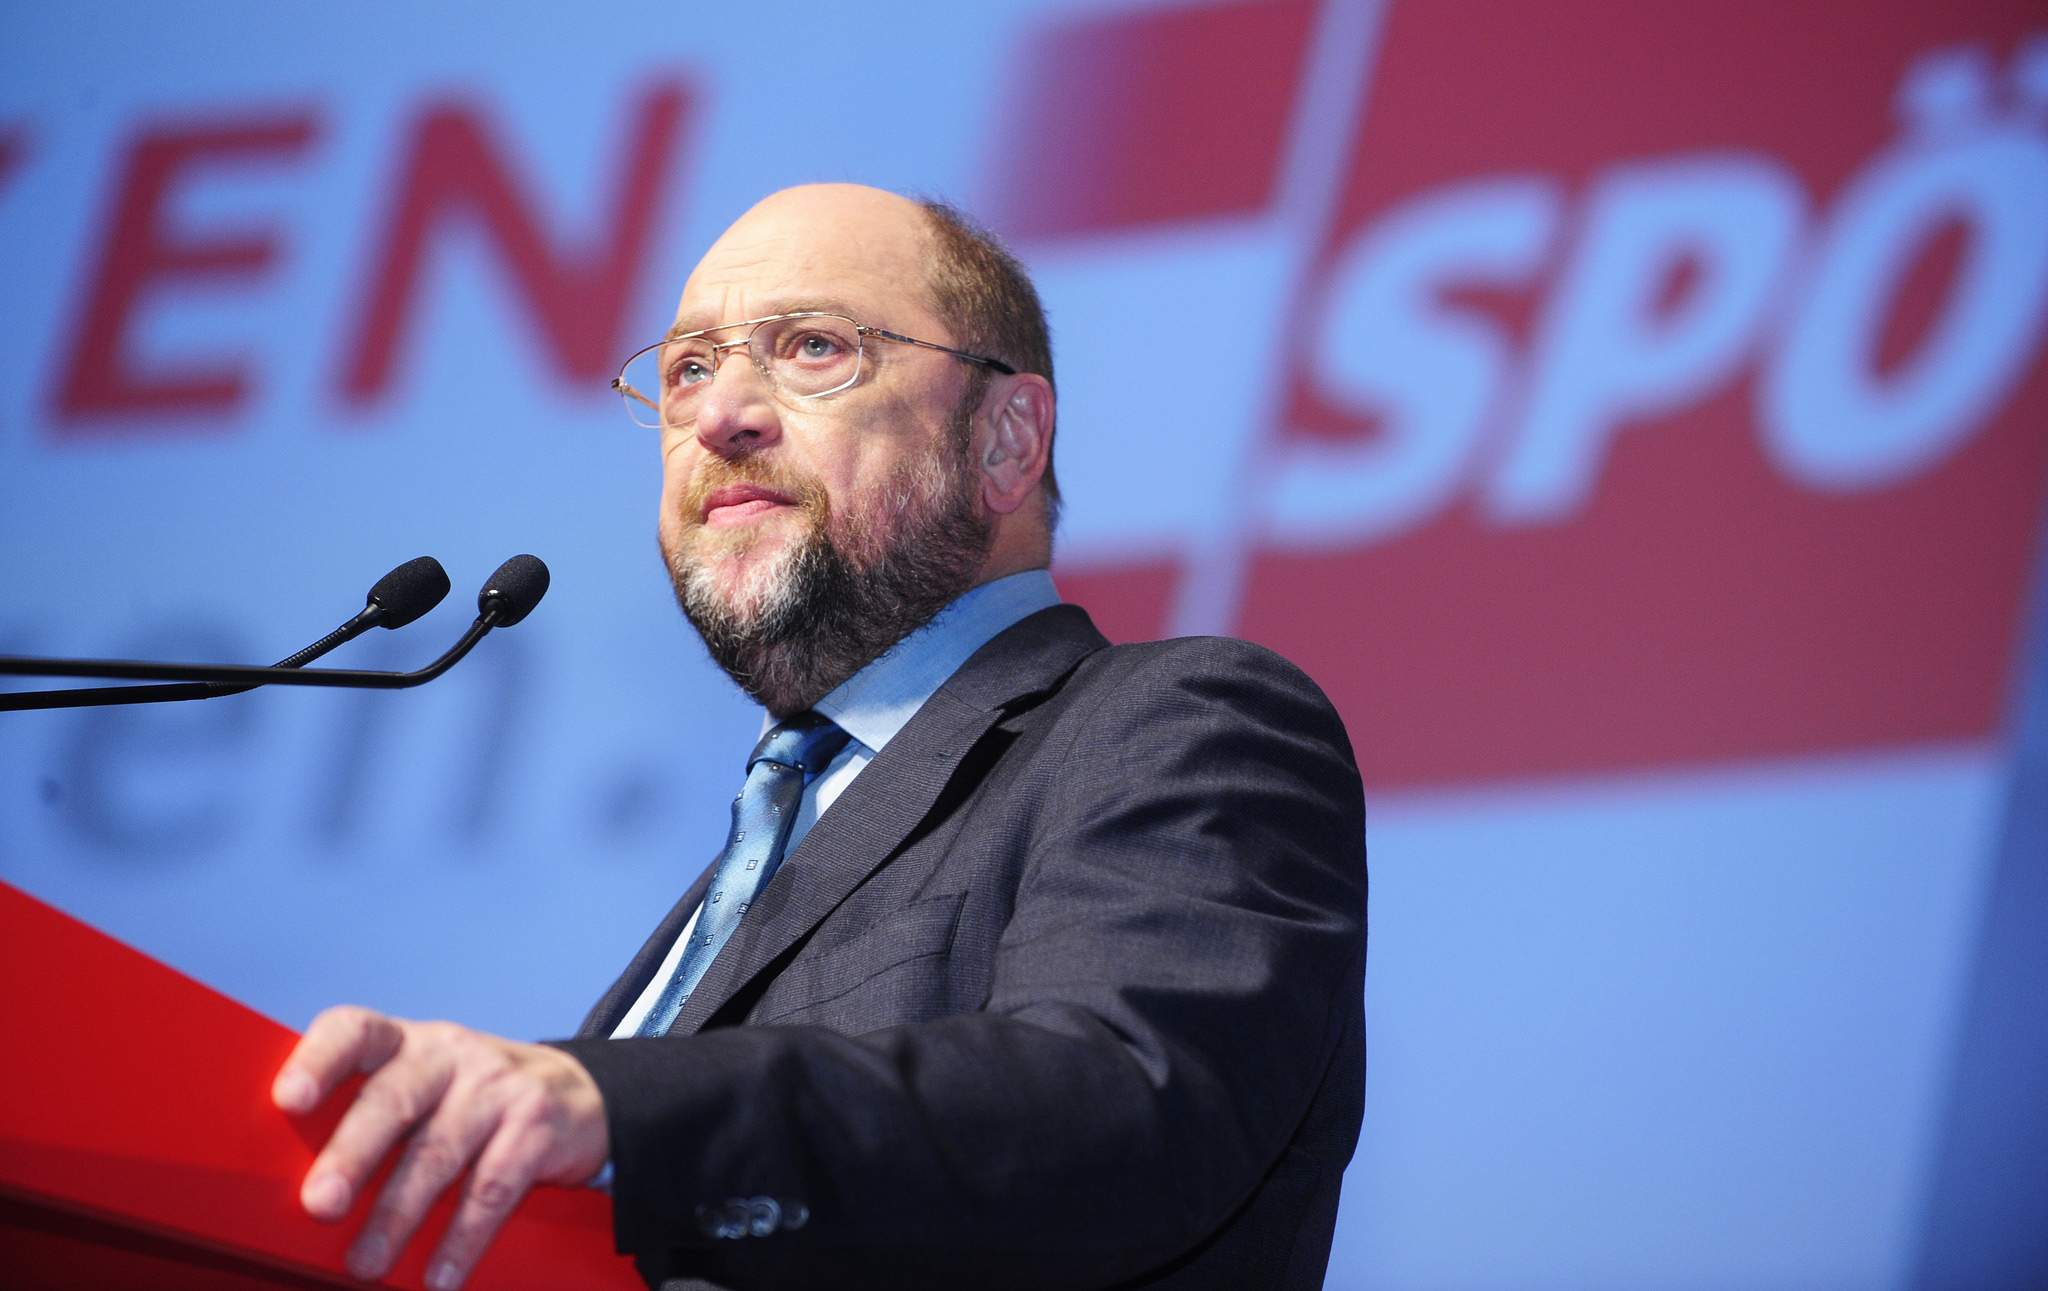 "EU-Parlamentspräsident warnt vor ""Pauschalkritik"" am Volk in Polen."